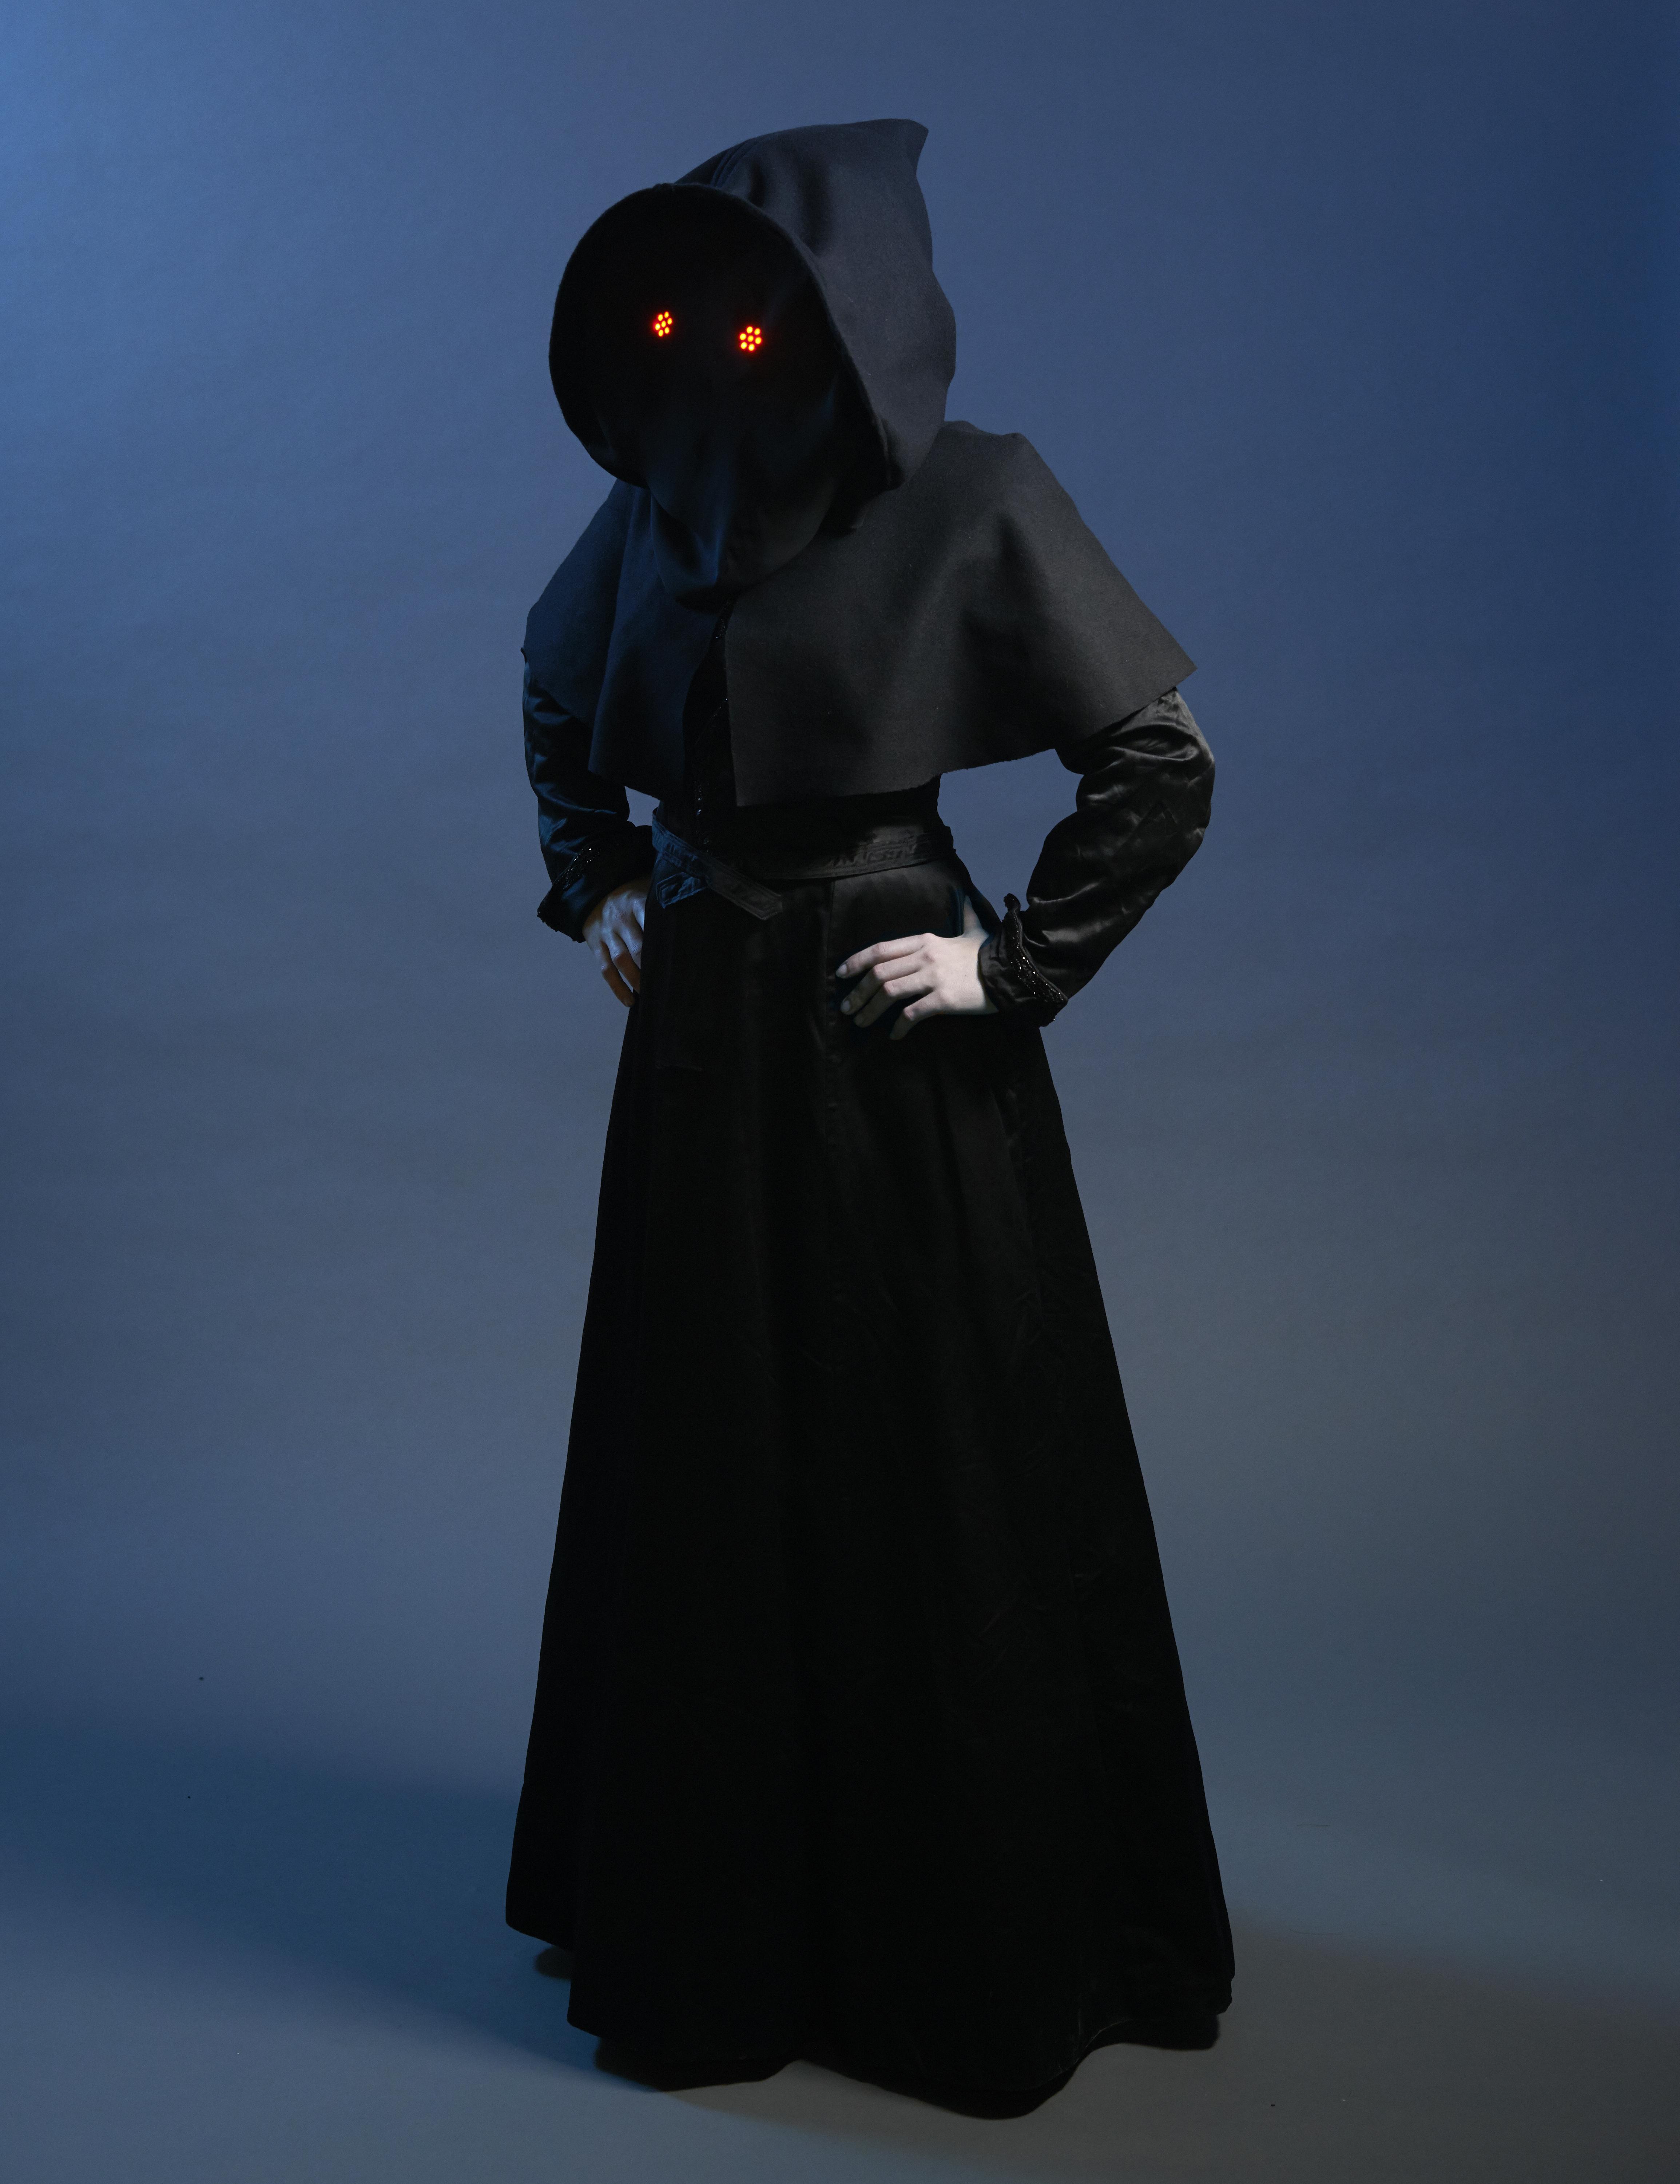 led_pixels_Mystical_Halloween_Hood_3756.jpg